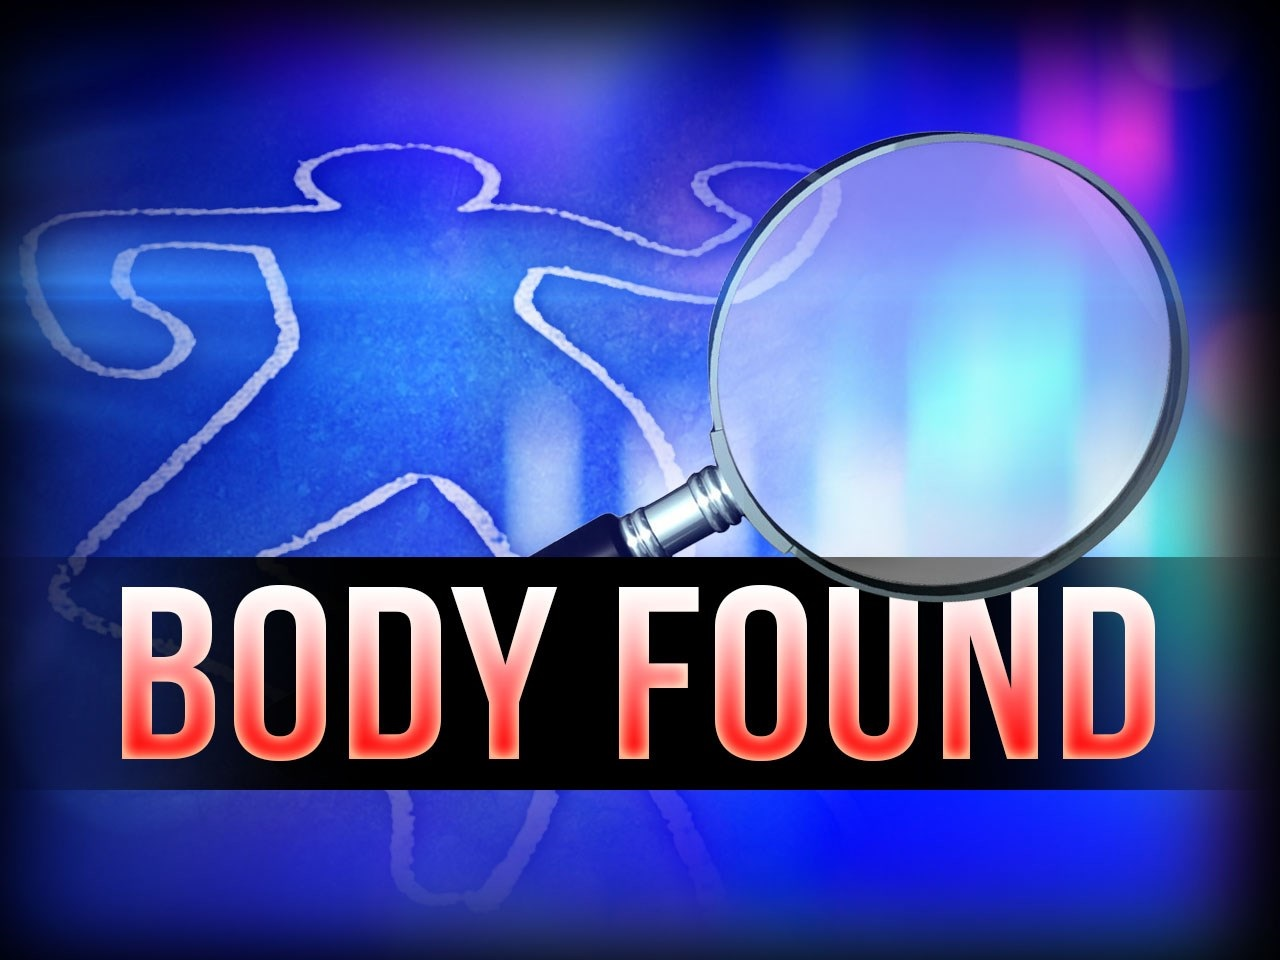 body found_1533834659093.jpg.jpg